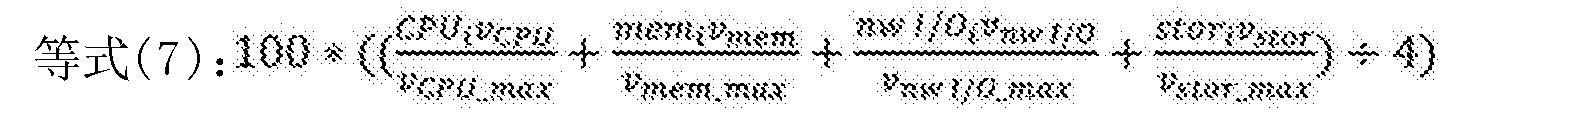 Figure CN105940378AD00122